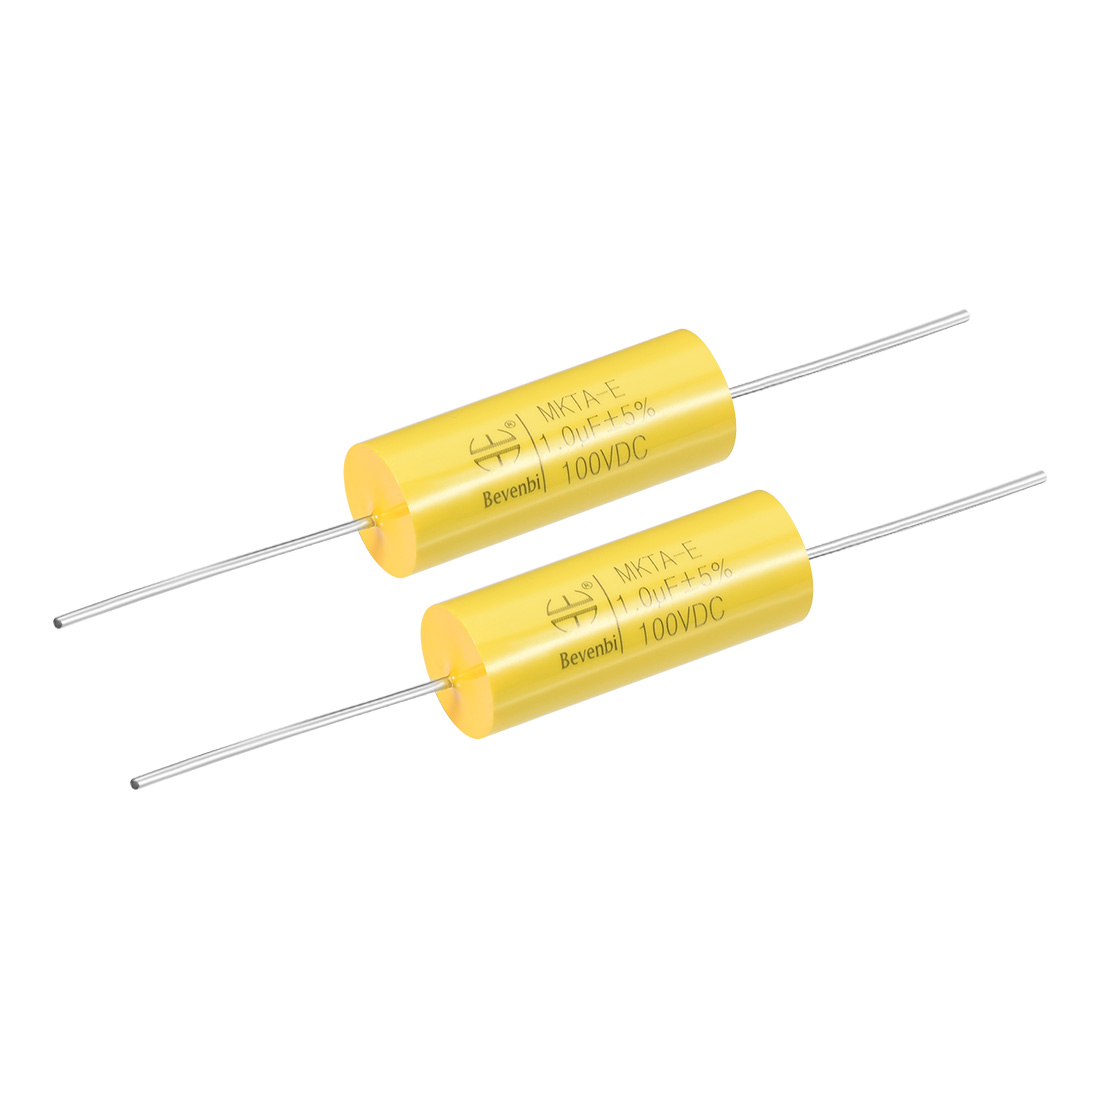 Film Capacitor 100V DC 1.0uF MKTA-E Round Polypropylene Capacitors Yellow 2pcs